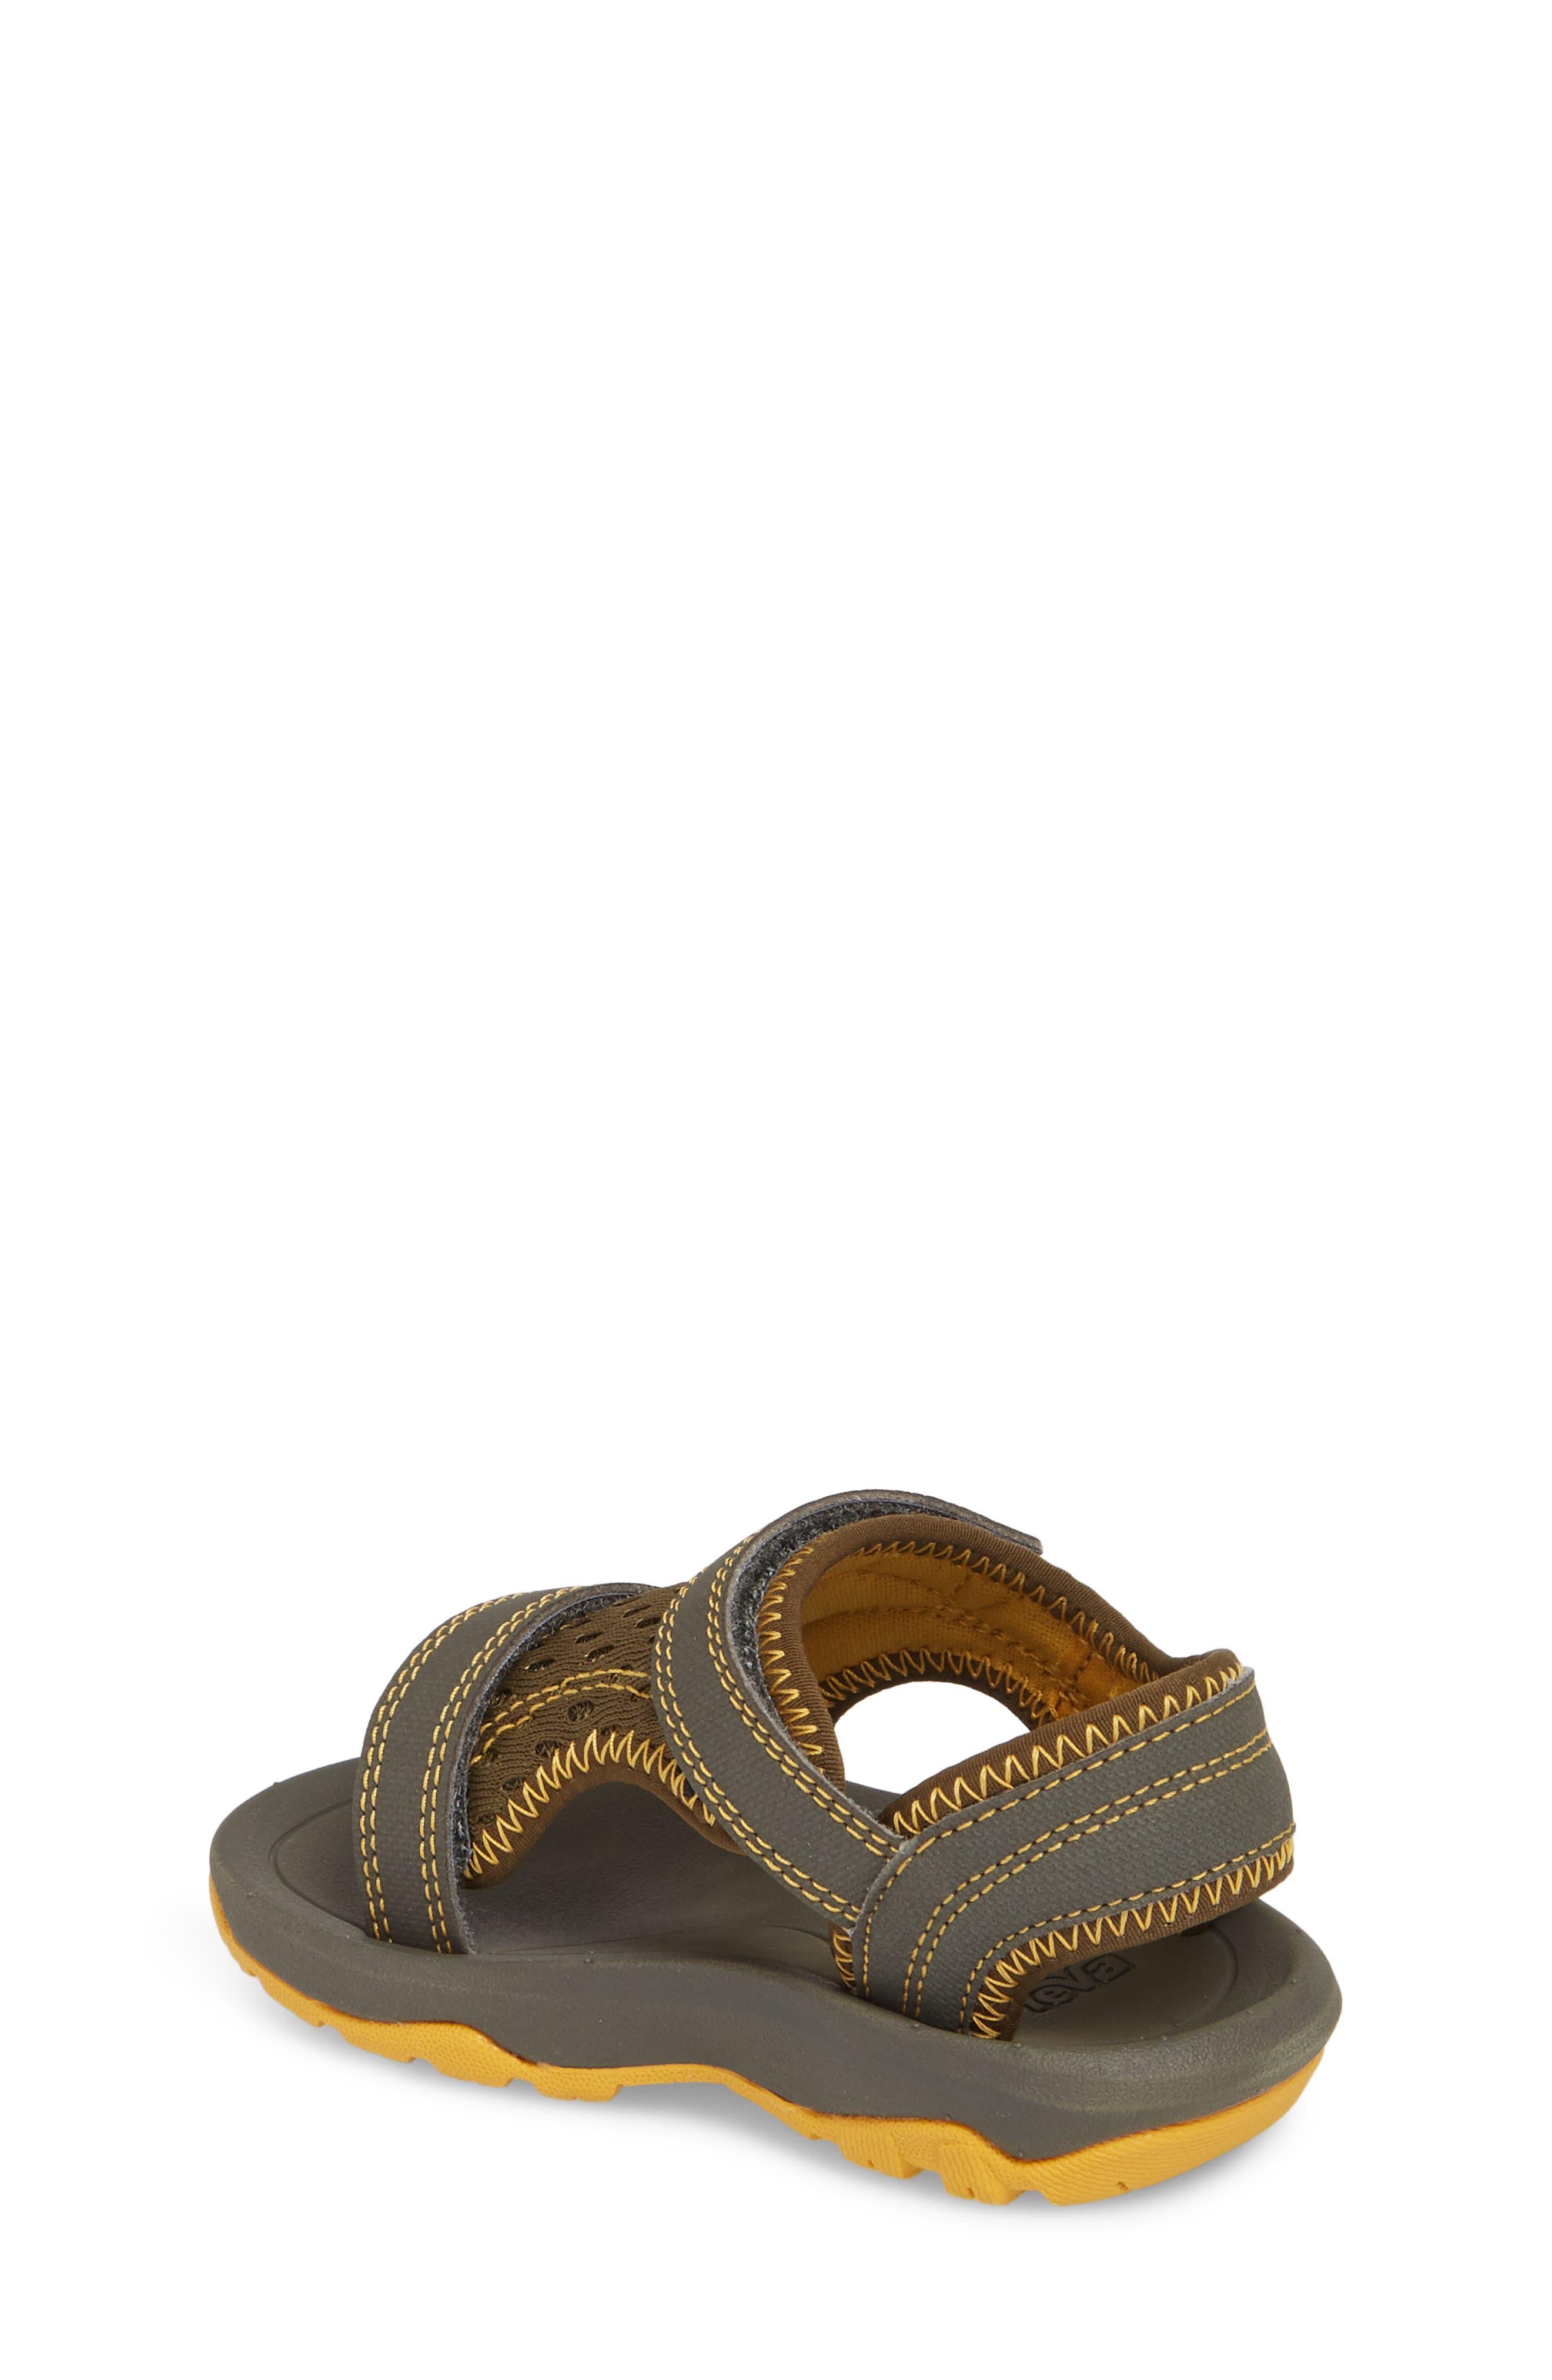 Psyclone XLT Sandal,                             Alternate thumbnail 2, color,                             Dark Olive